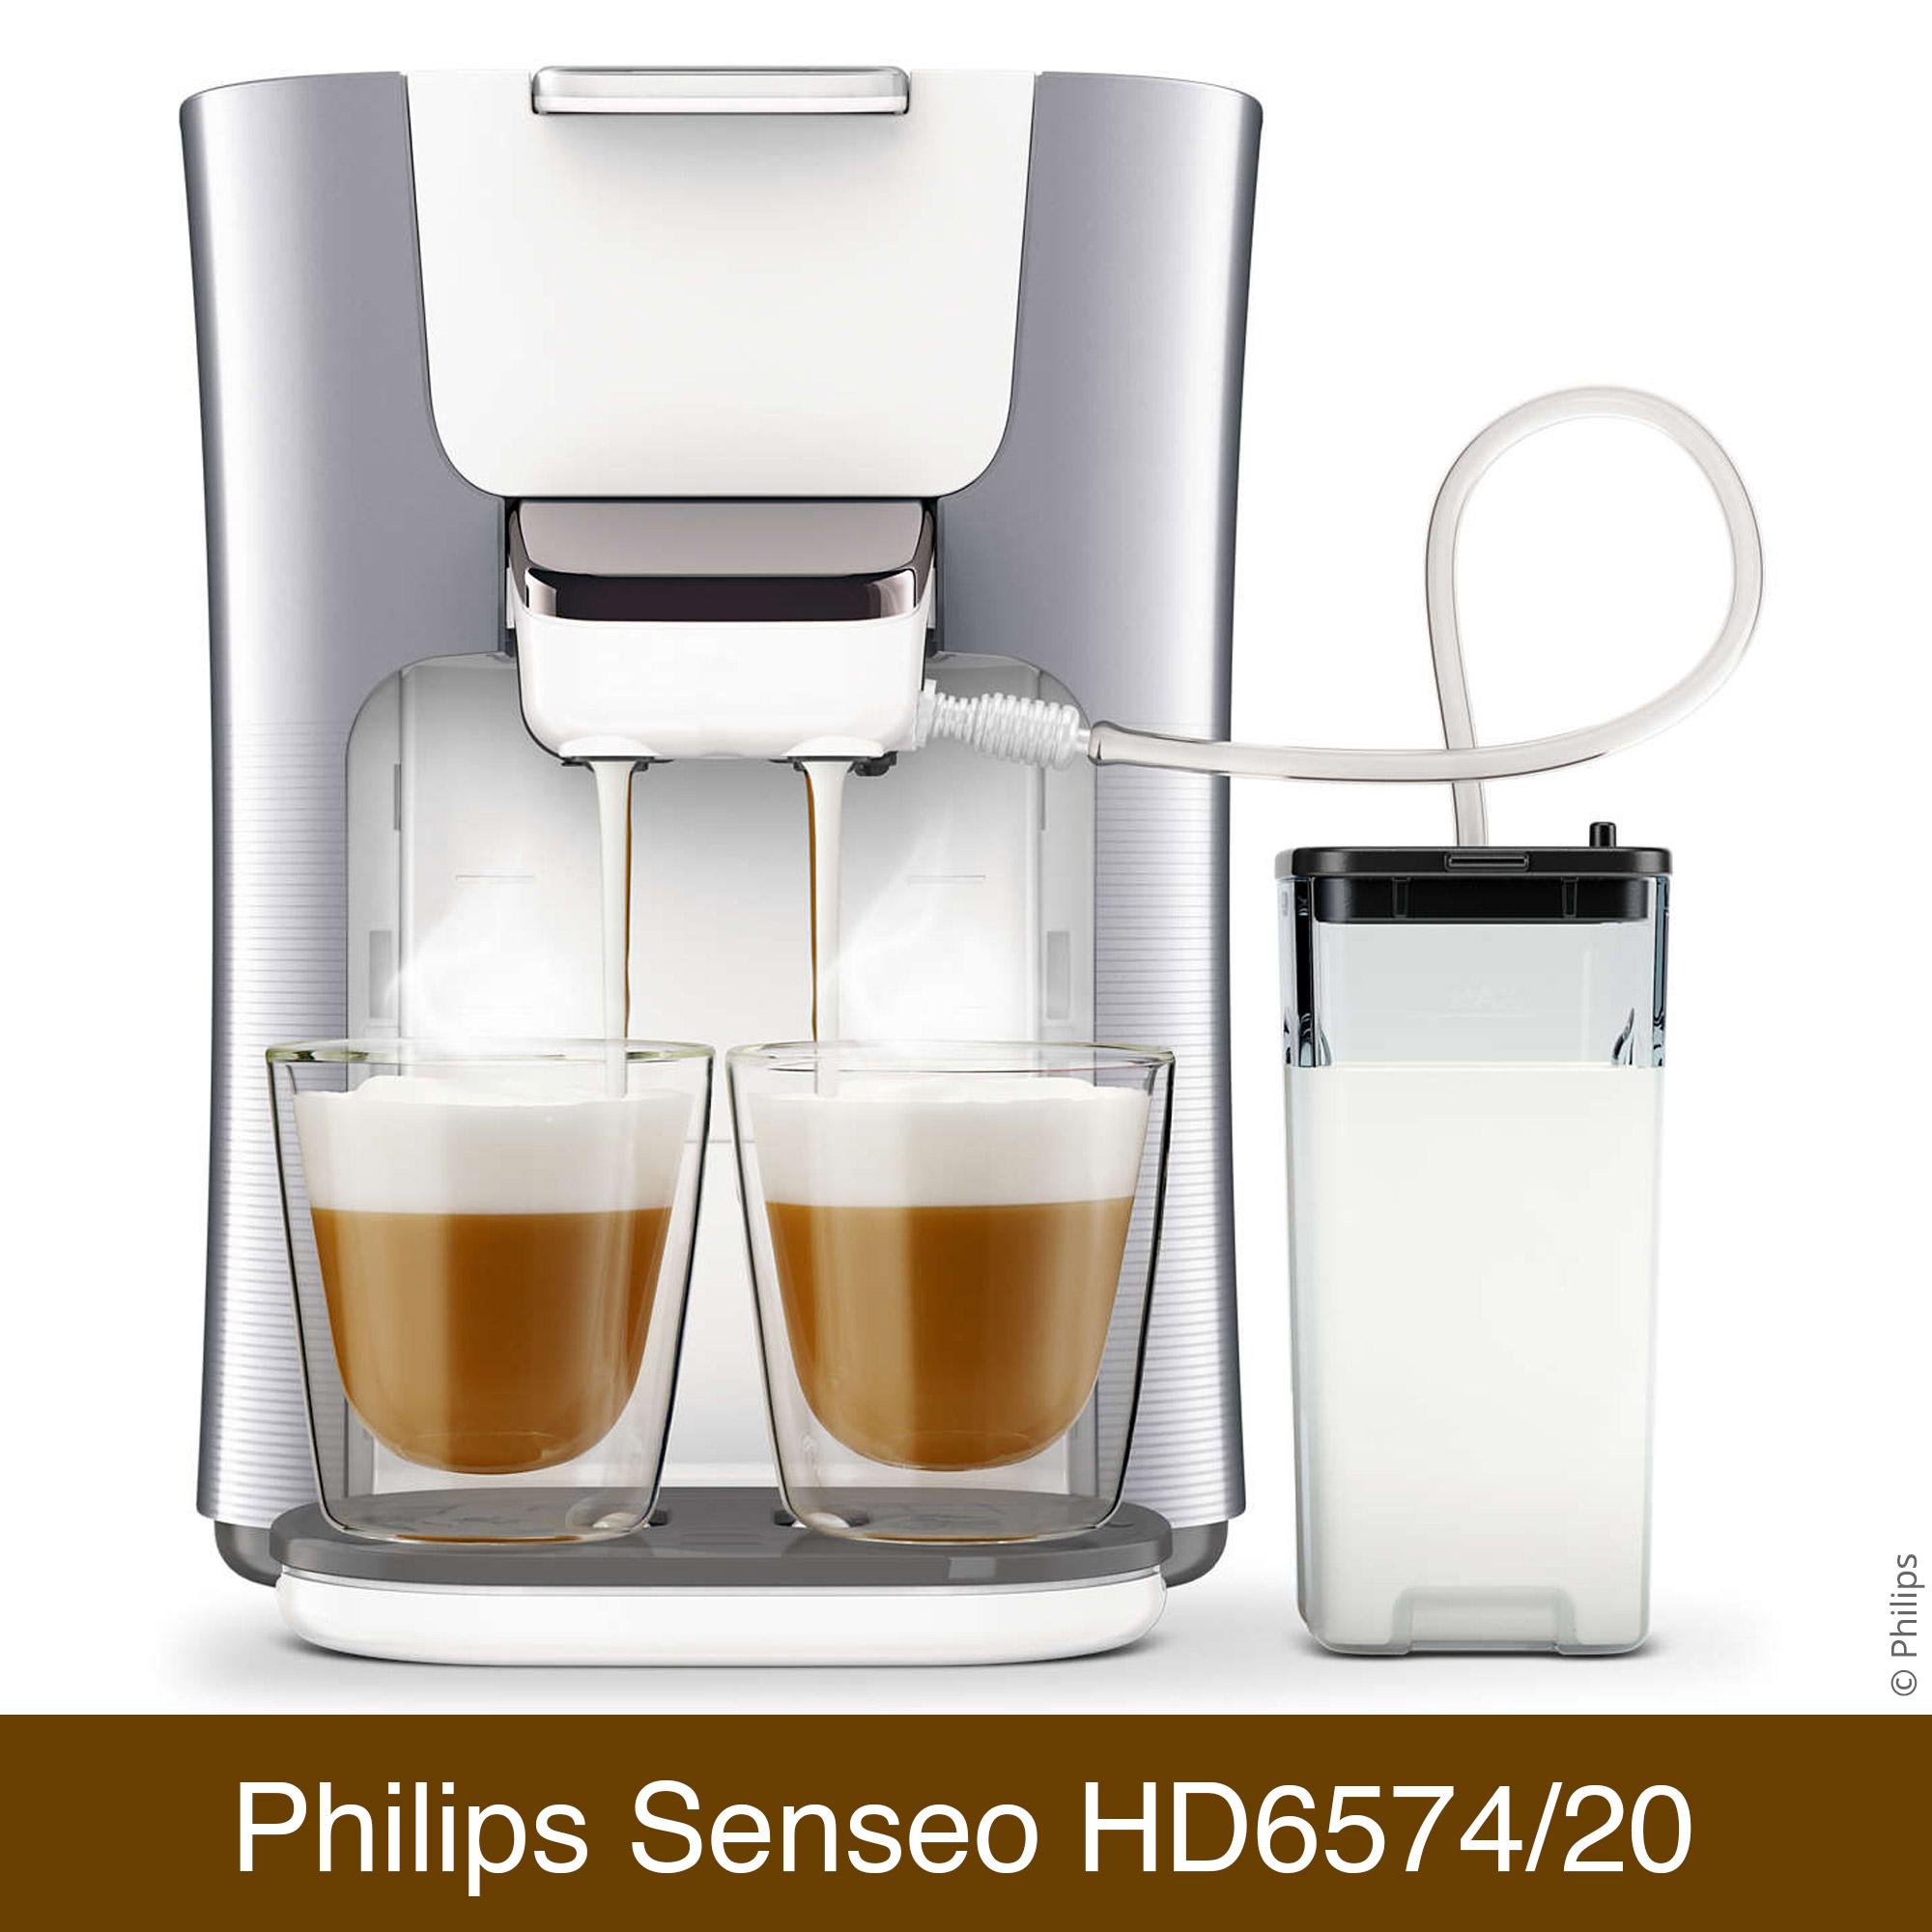 Philips Senseo HD6574/20 Latte Duo Vergleich | Kaffeepadmaschine